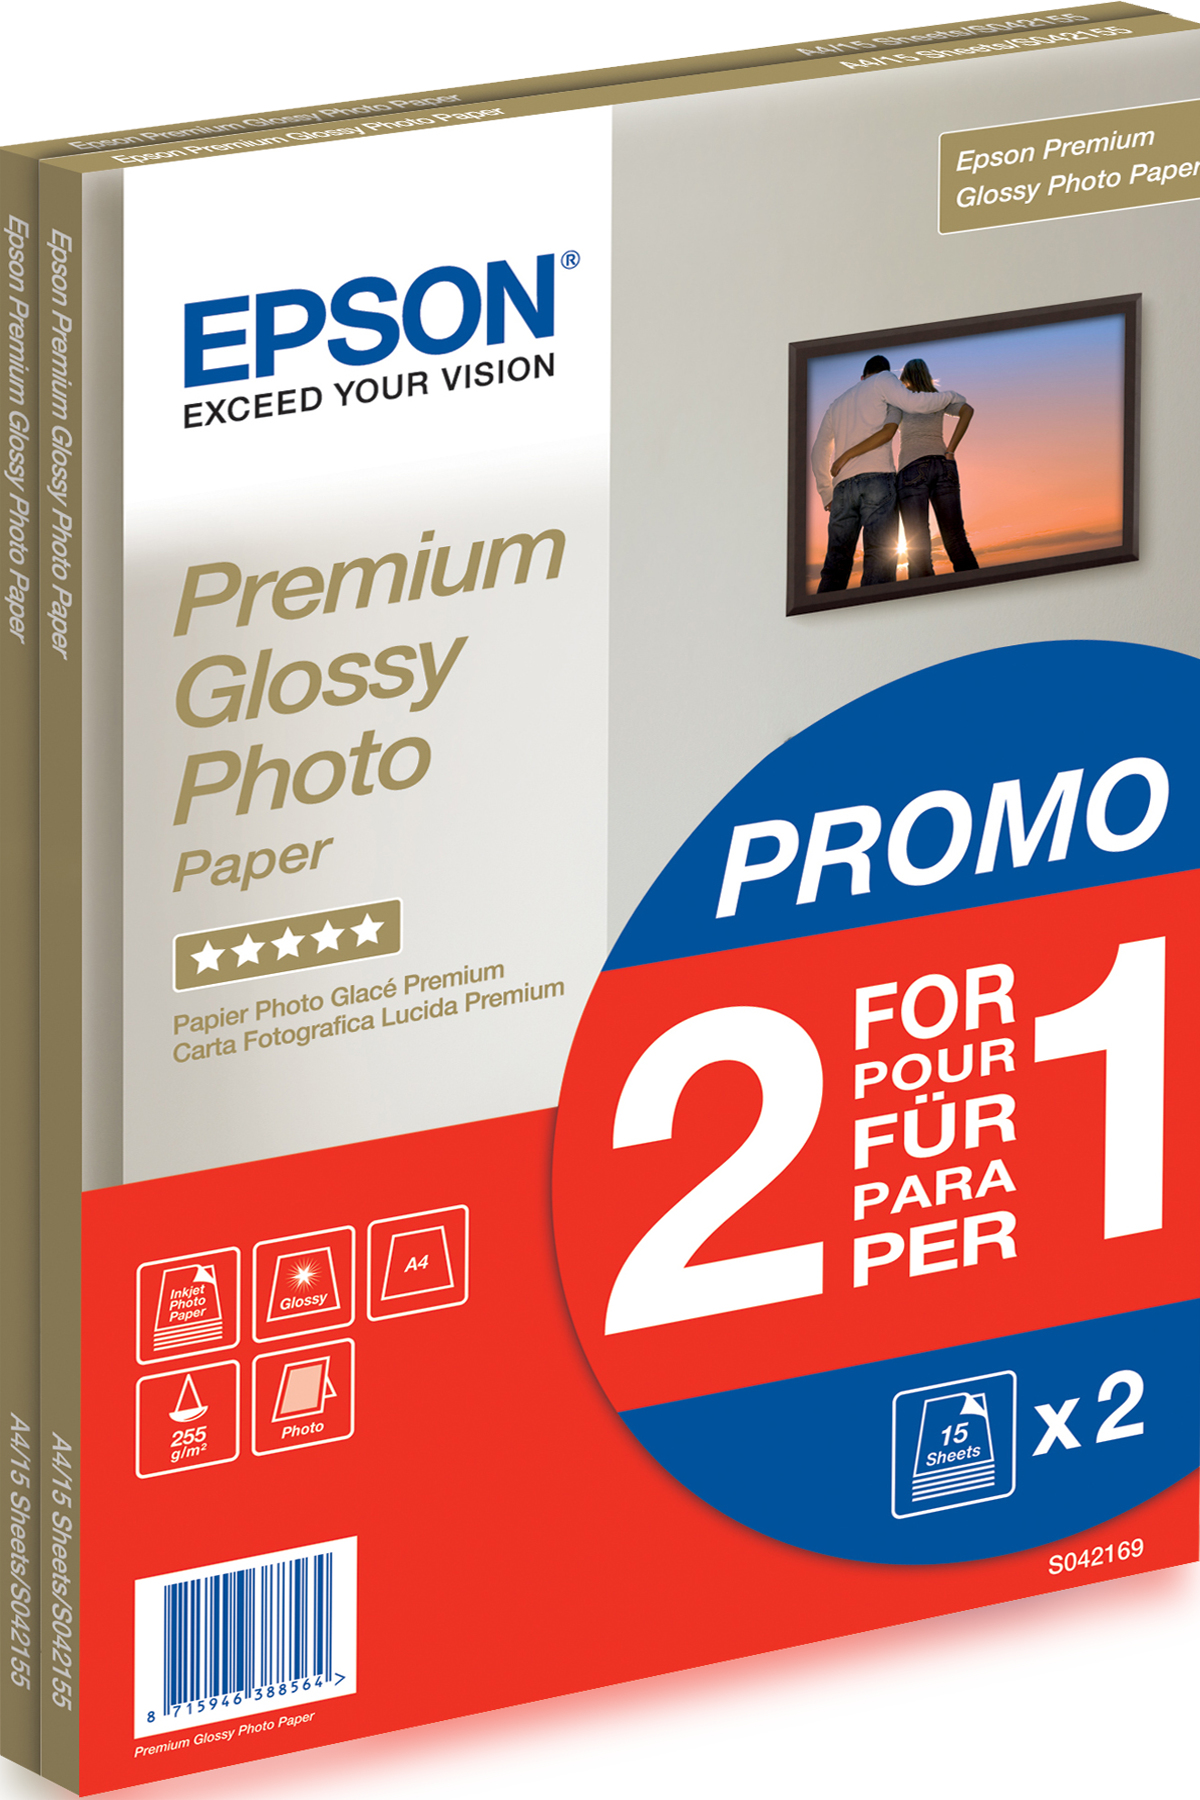 Epson Premium Glossy Photo Paper - A4 - 2x 15 Sheets